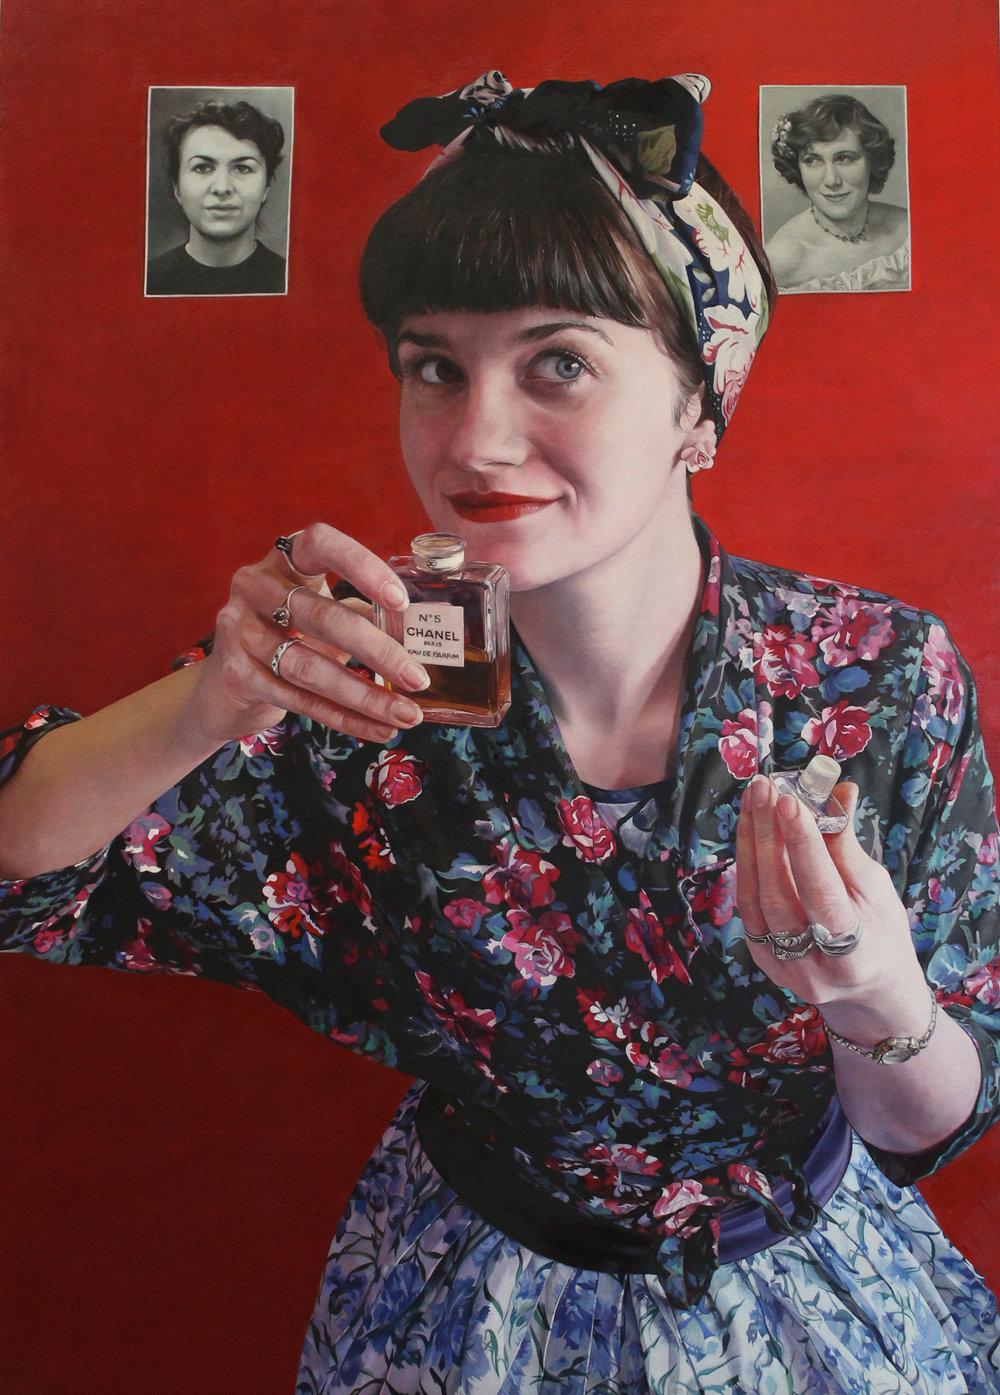 Sarah Hope, Memory's Scent, Oil on board, 70cm x 50cm x 3cm